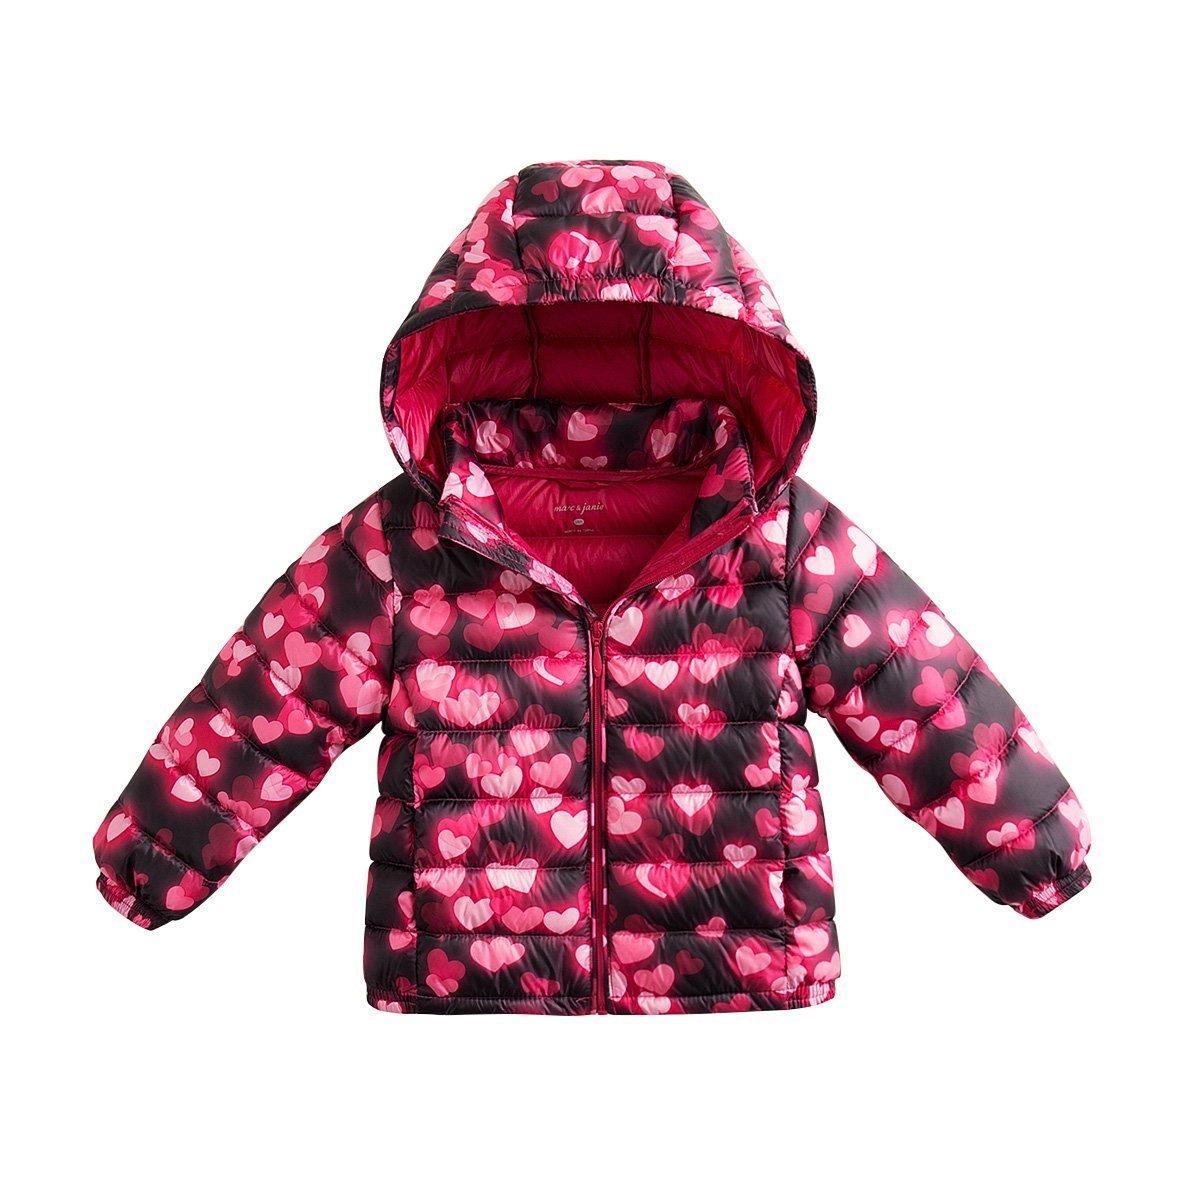 marc janie Little Girls Boys' Outerwear Ultra Light Weight Down Jacket 18 Months (73 cm) Glowing Love